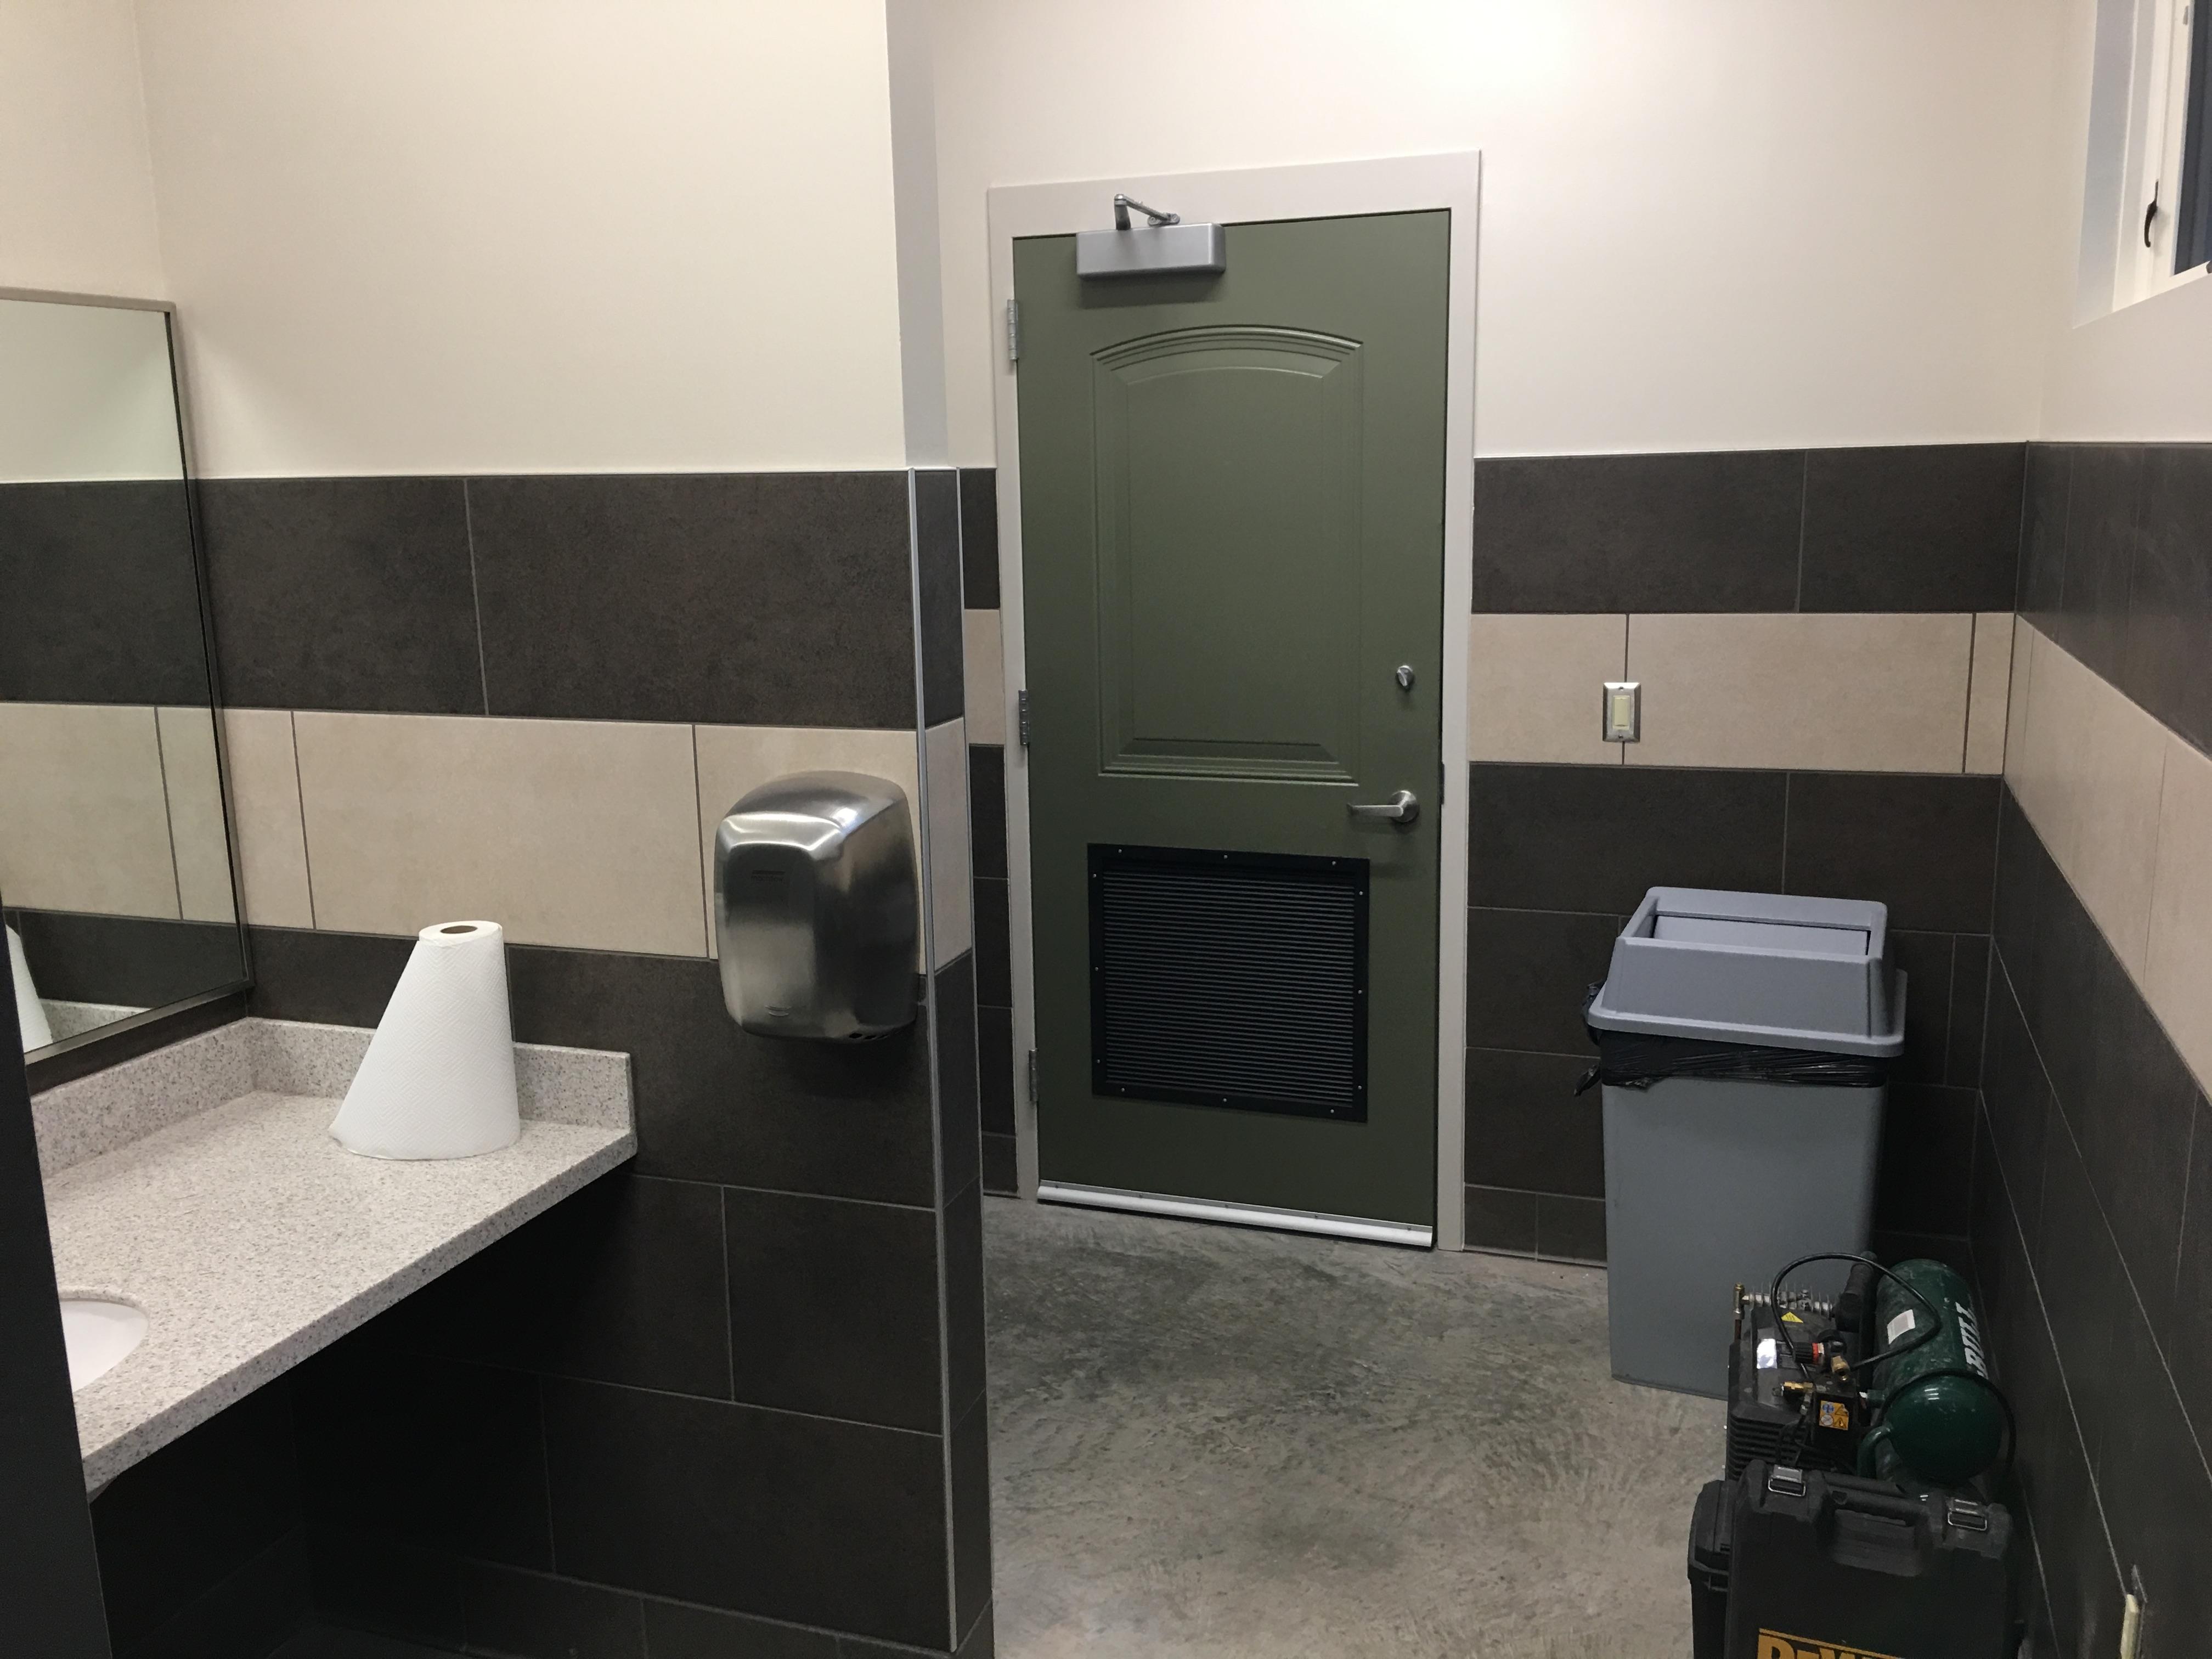 Sapling Grove Bathroom Building